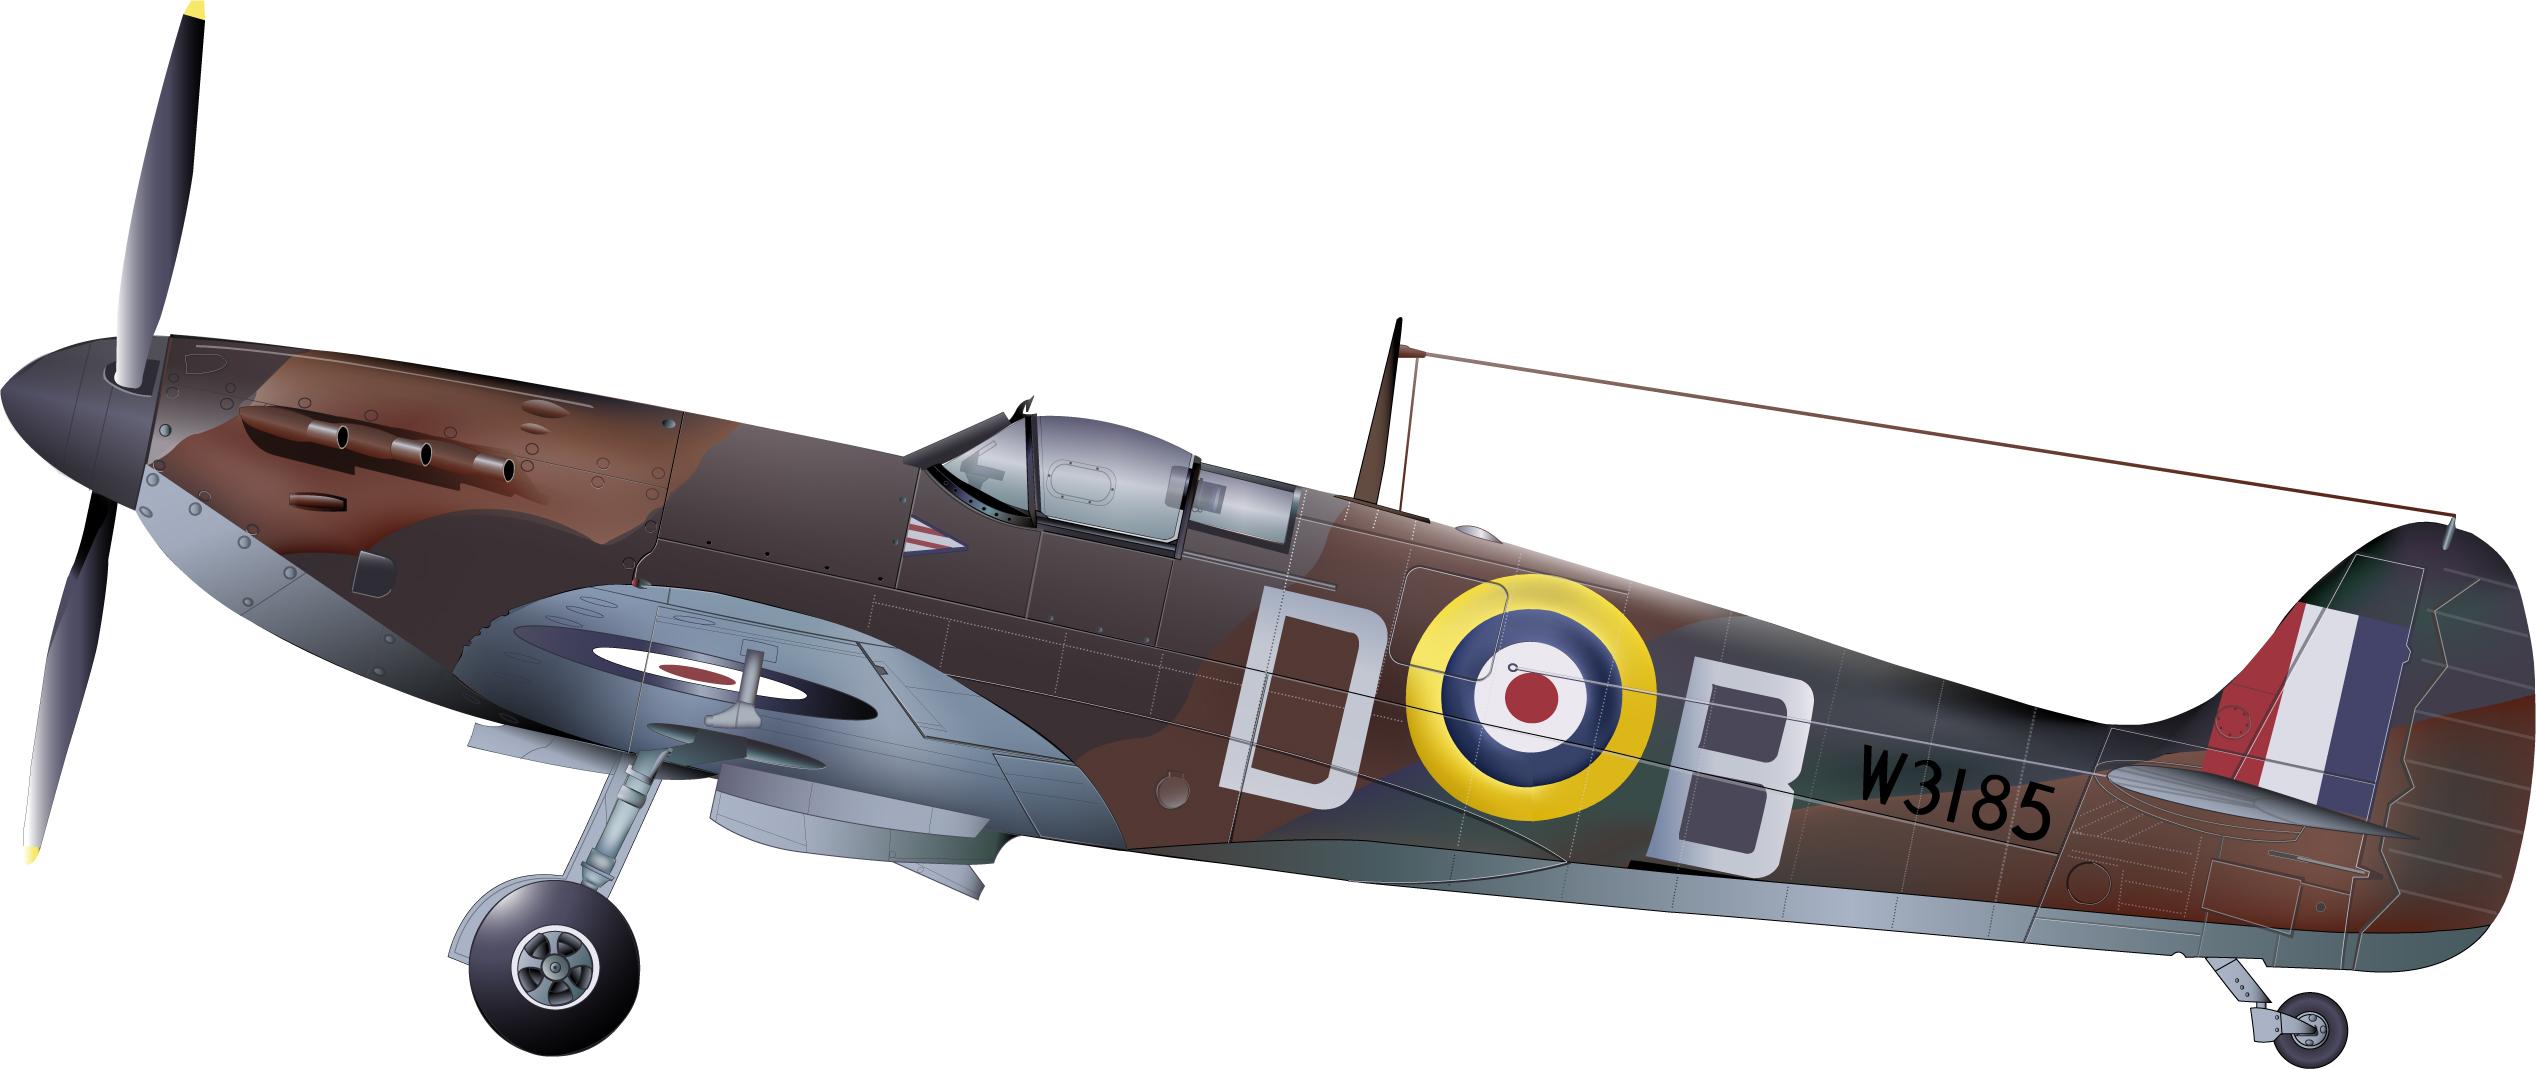 2536x1069 Supermarine Spitfire Mk. Va By Wakdor